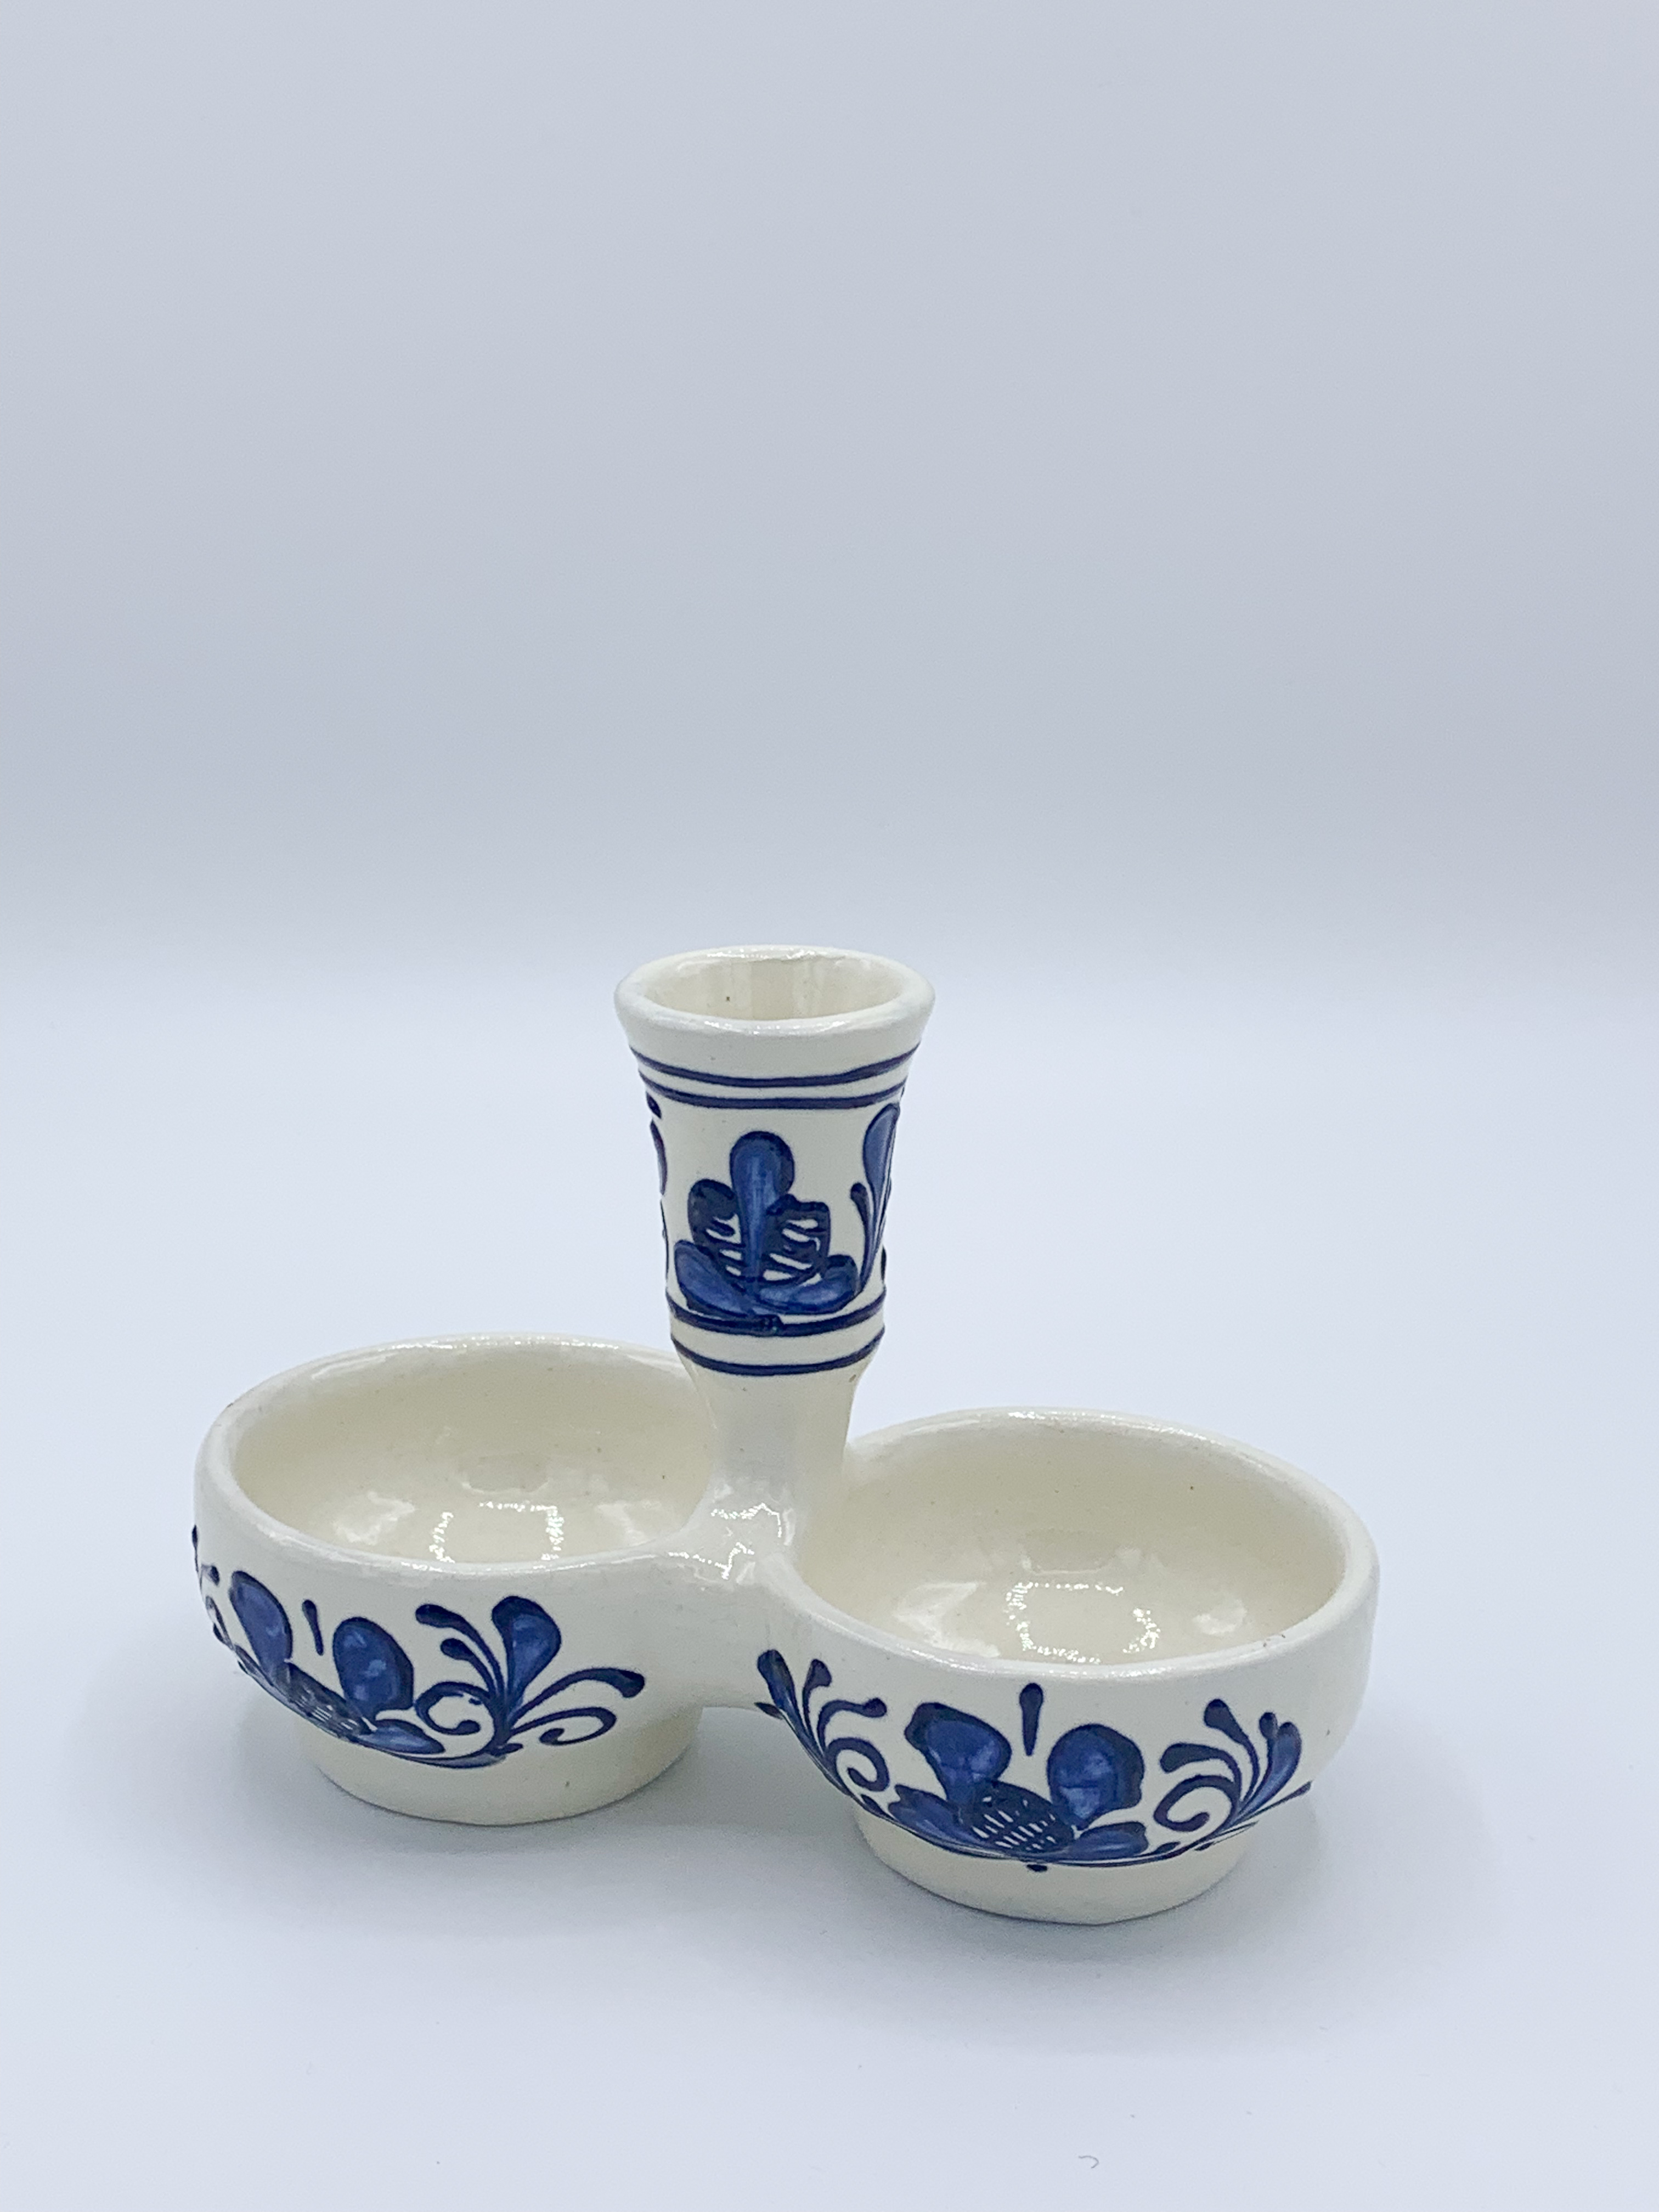 Solnita din ceramica de corund 0